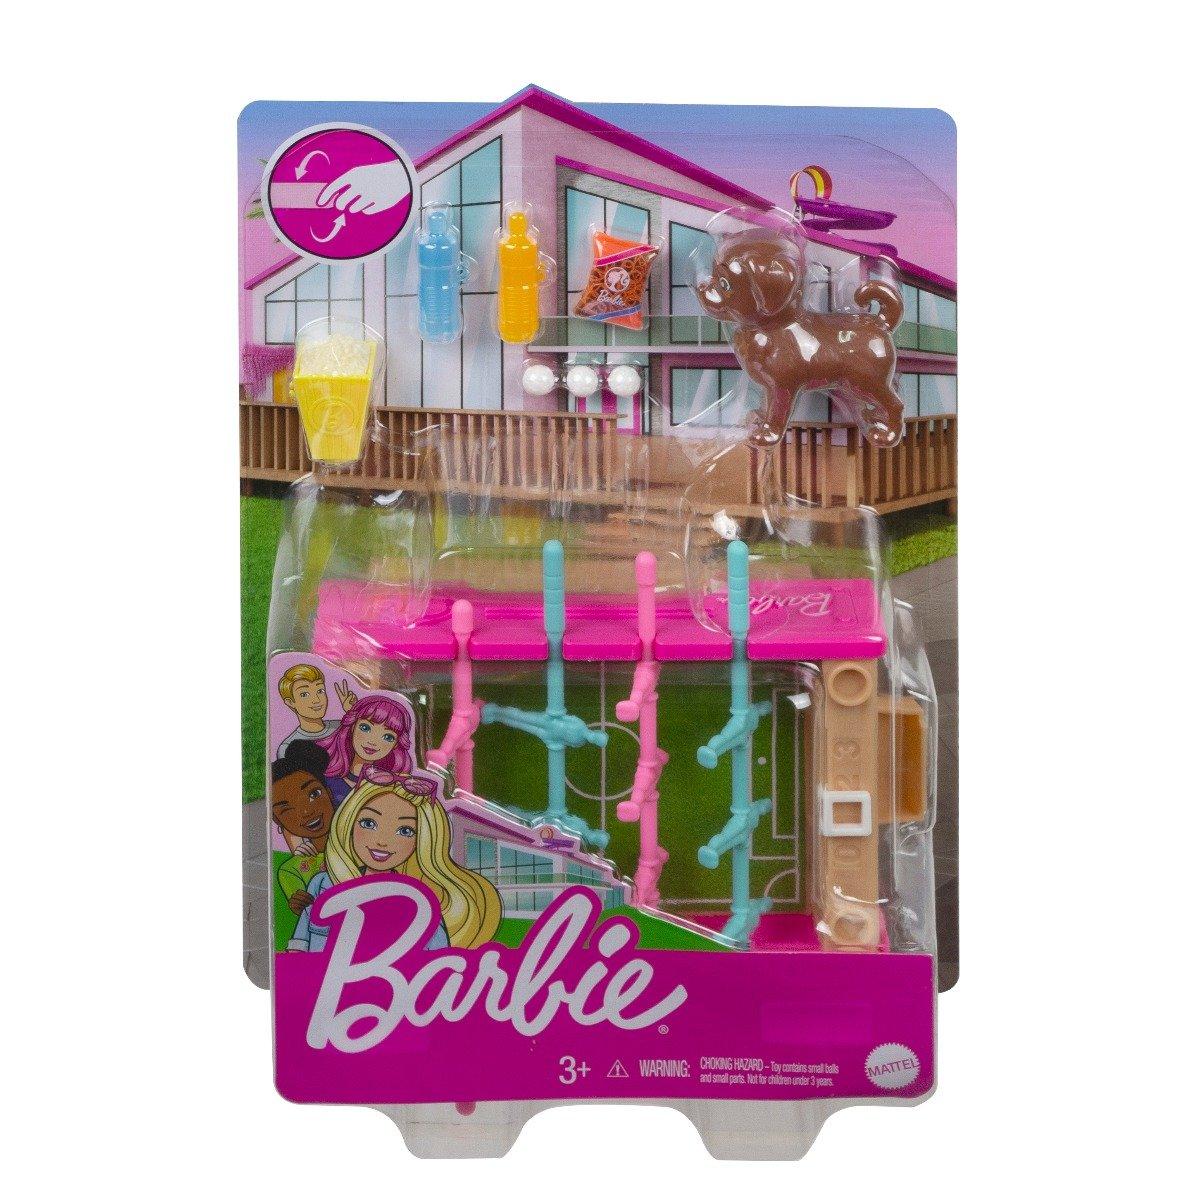 Set de joaca Barbie, Mobilier exterior si catelus, GRG77